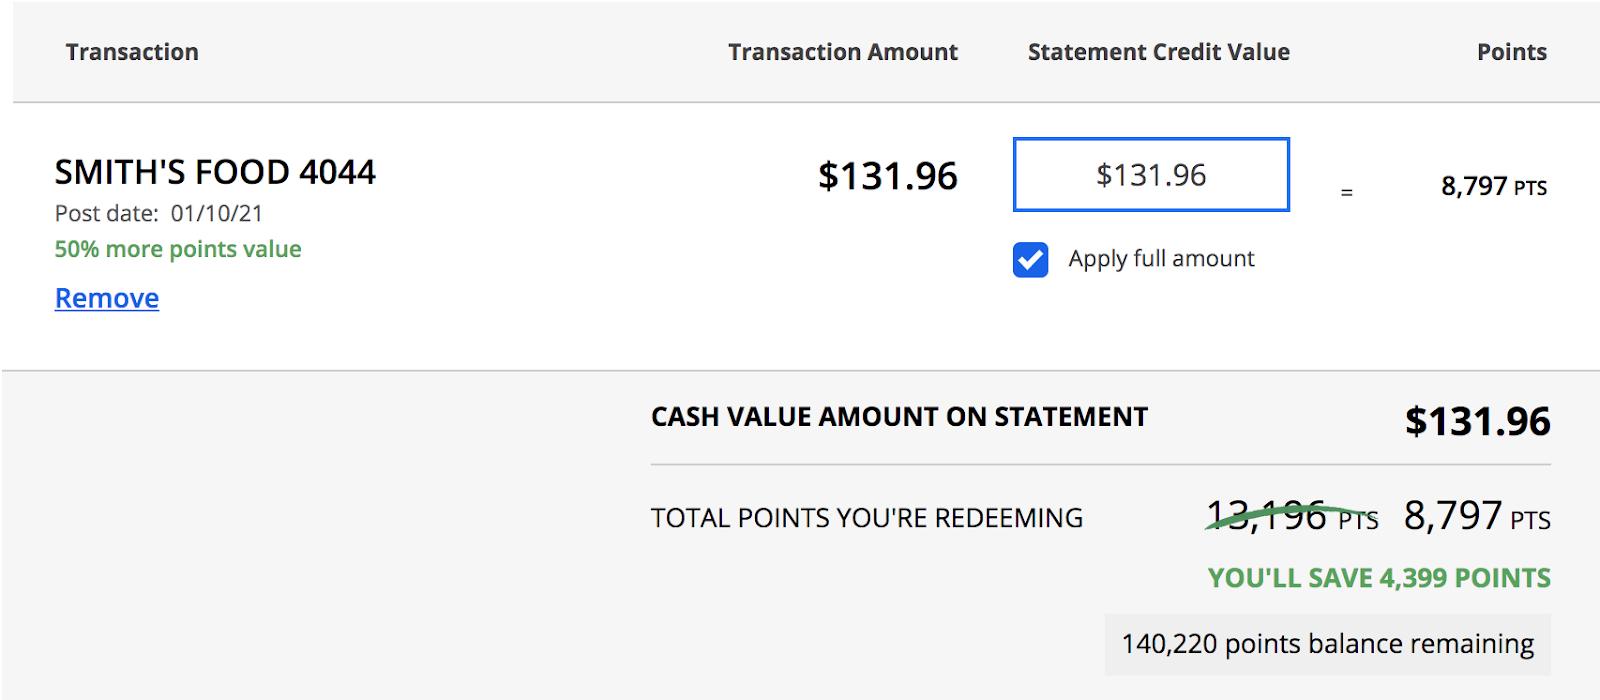 cash value amount on statement